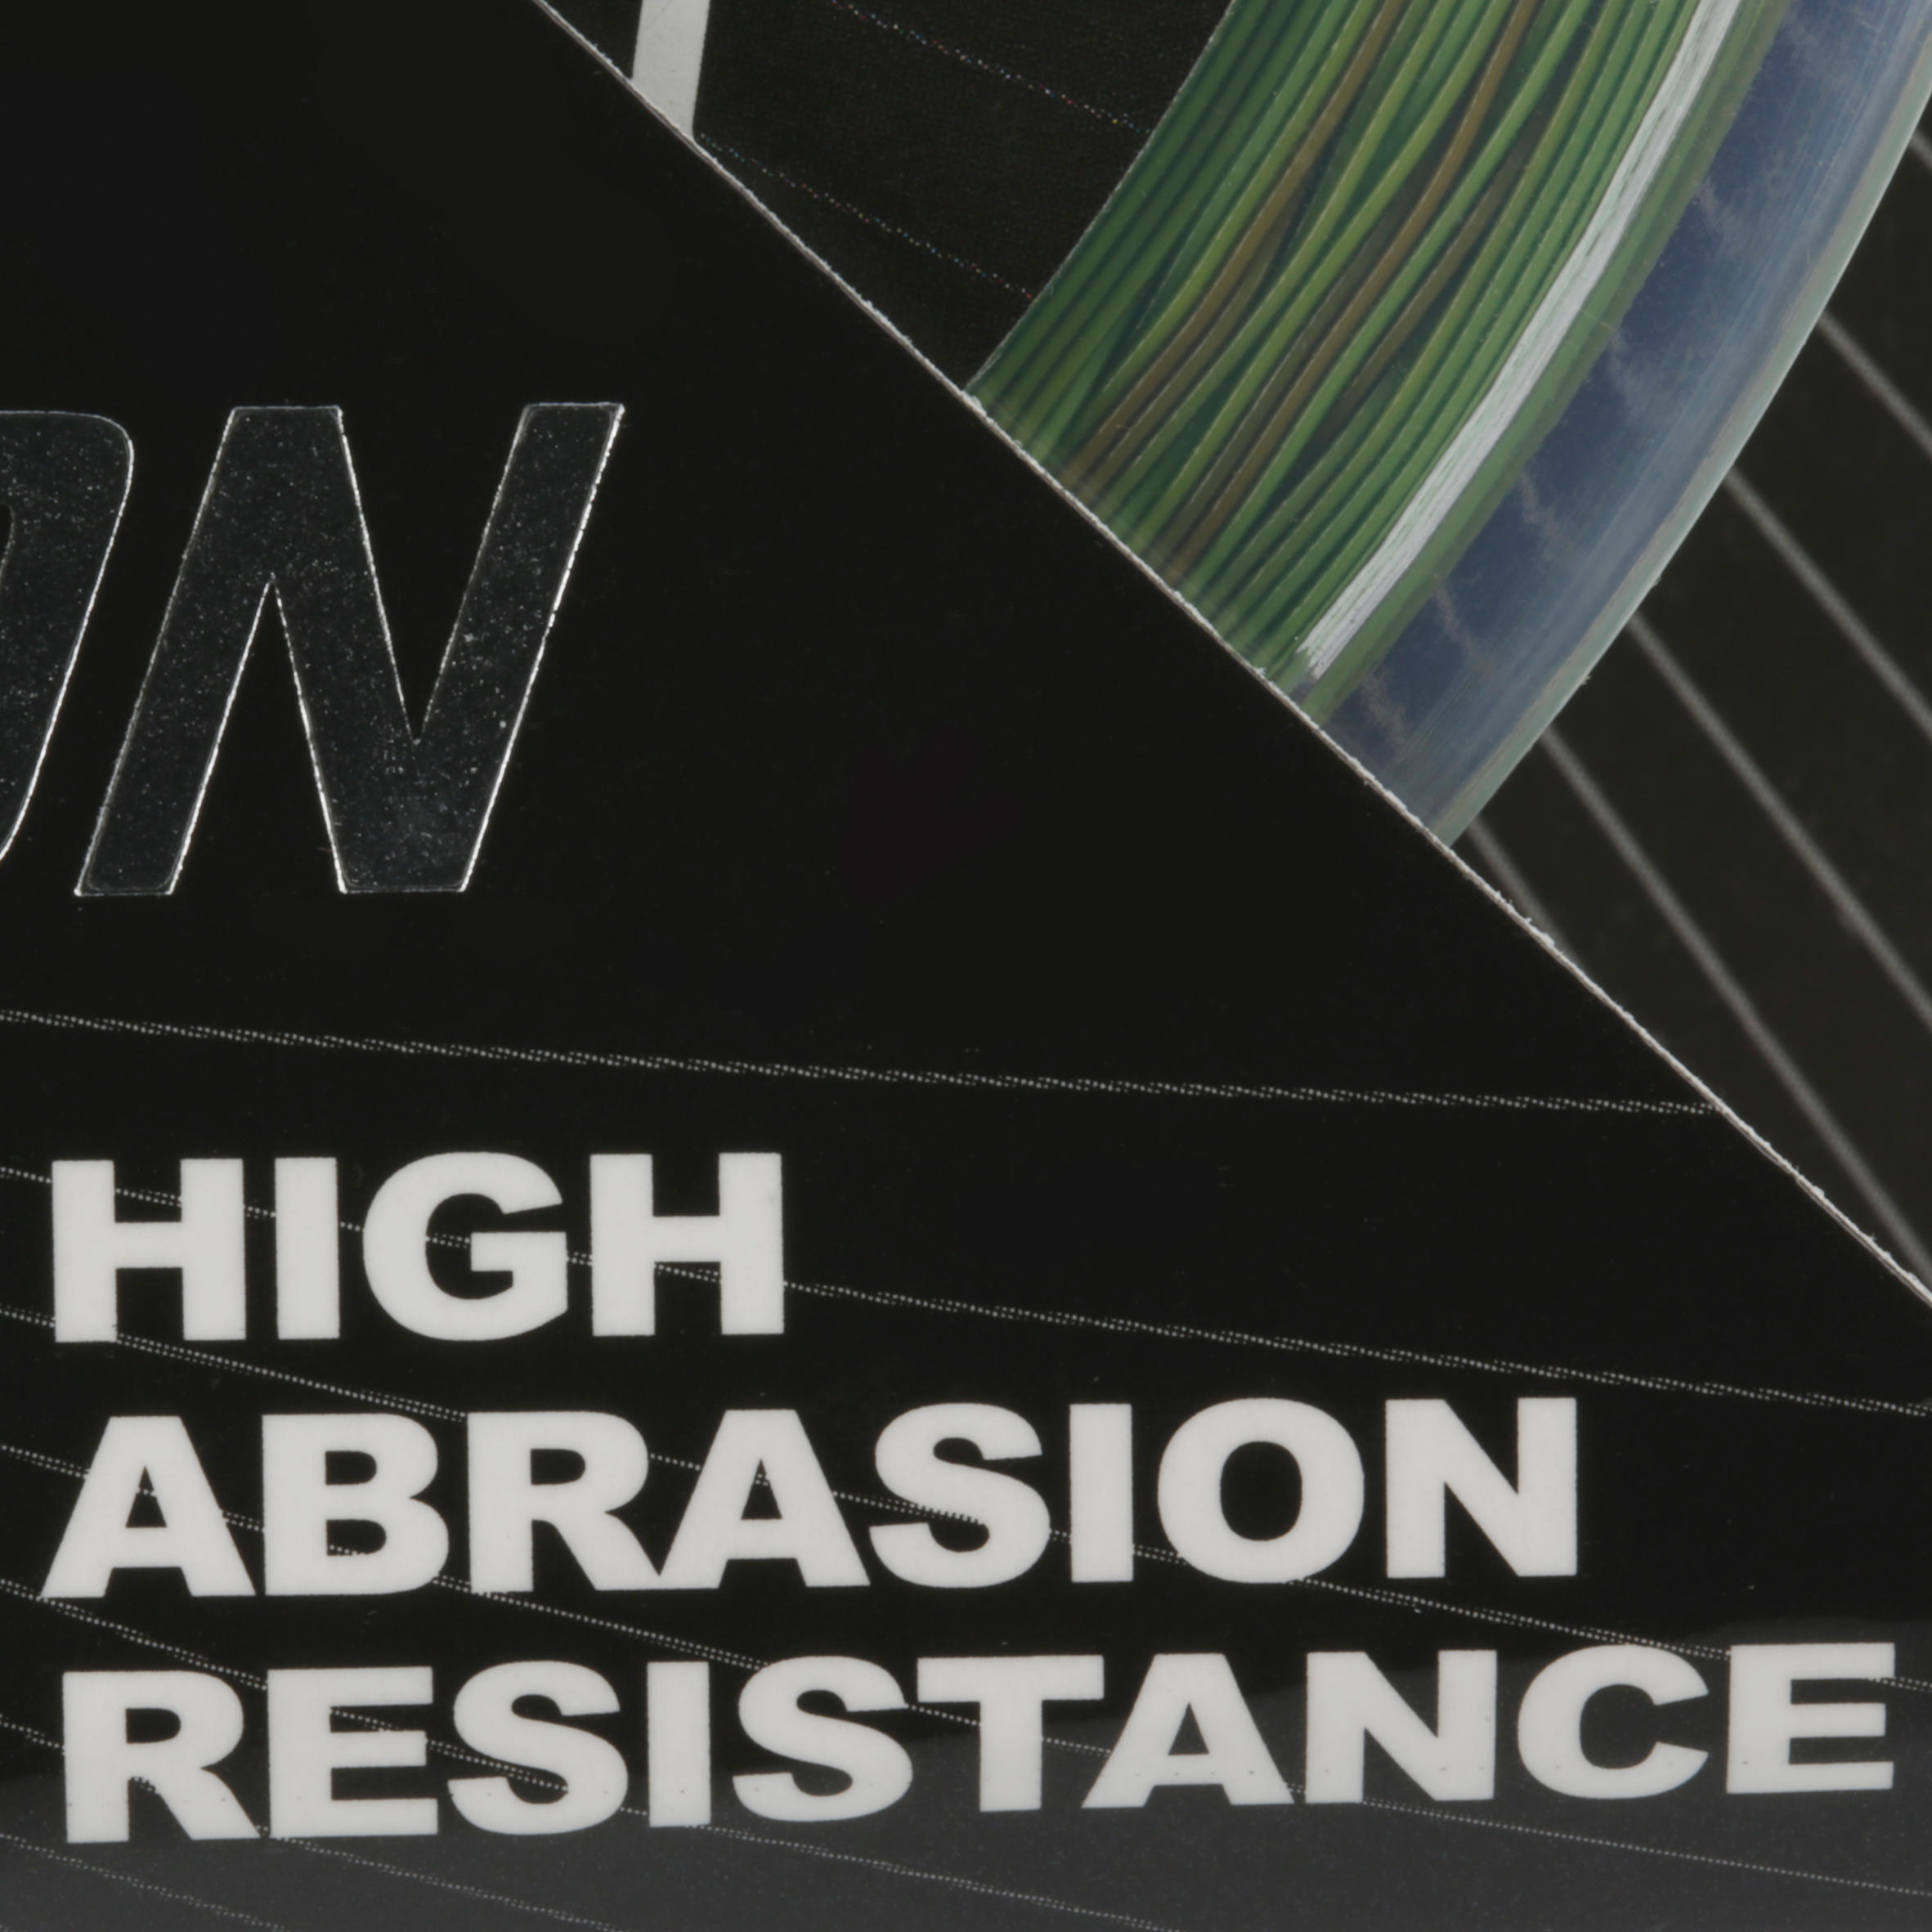 FIL PÊCHE DE LA CARPE LIGNE ABRASION CAMO 1000 M